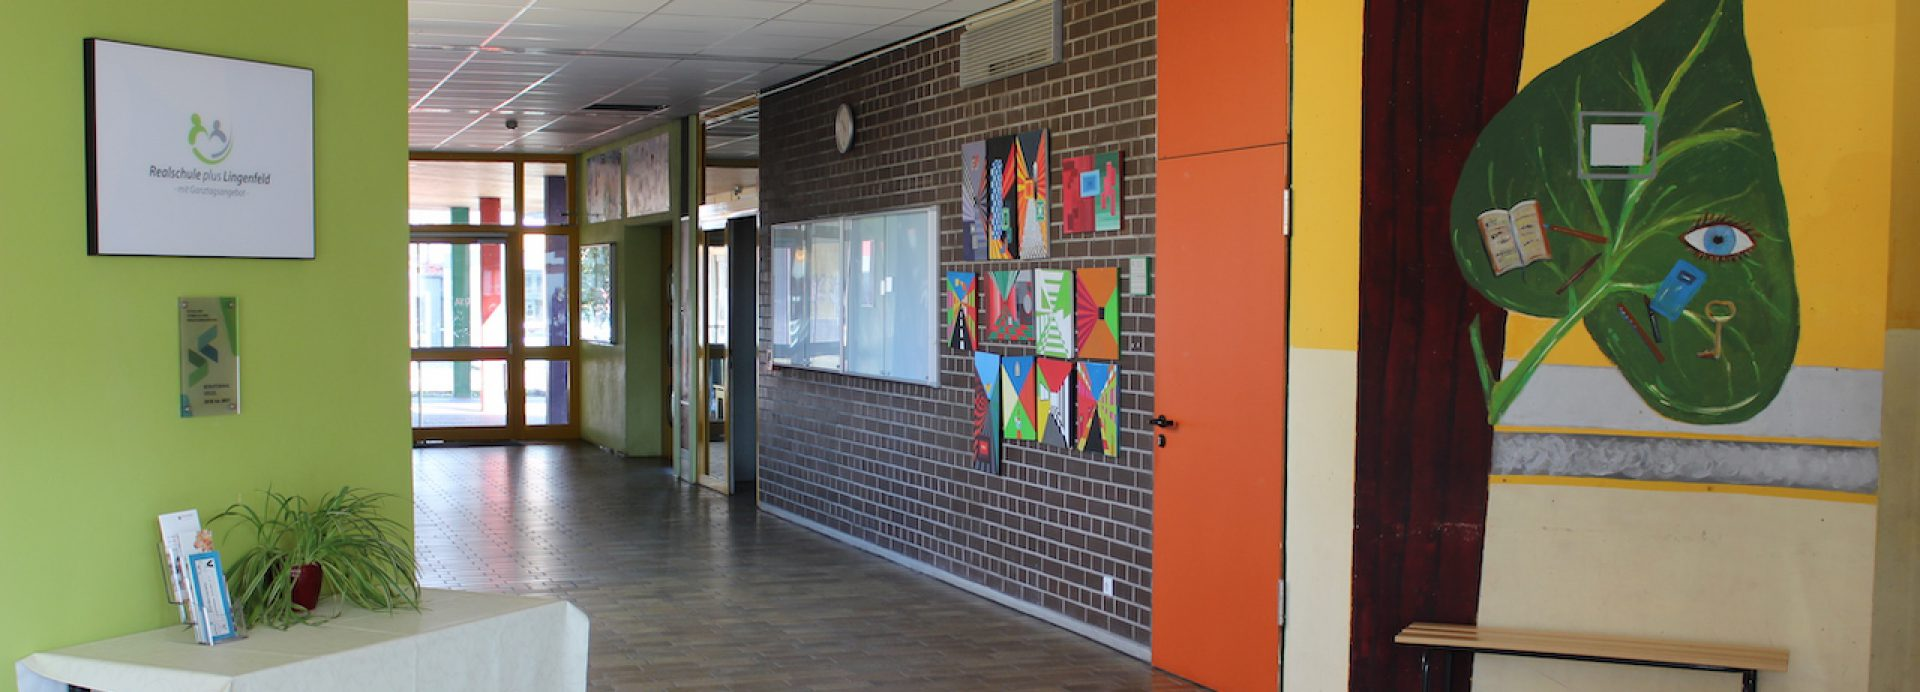 Realschule plus Lingenfeld